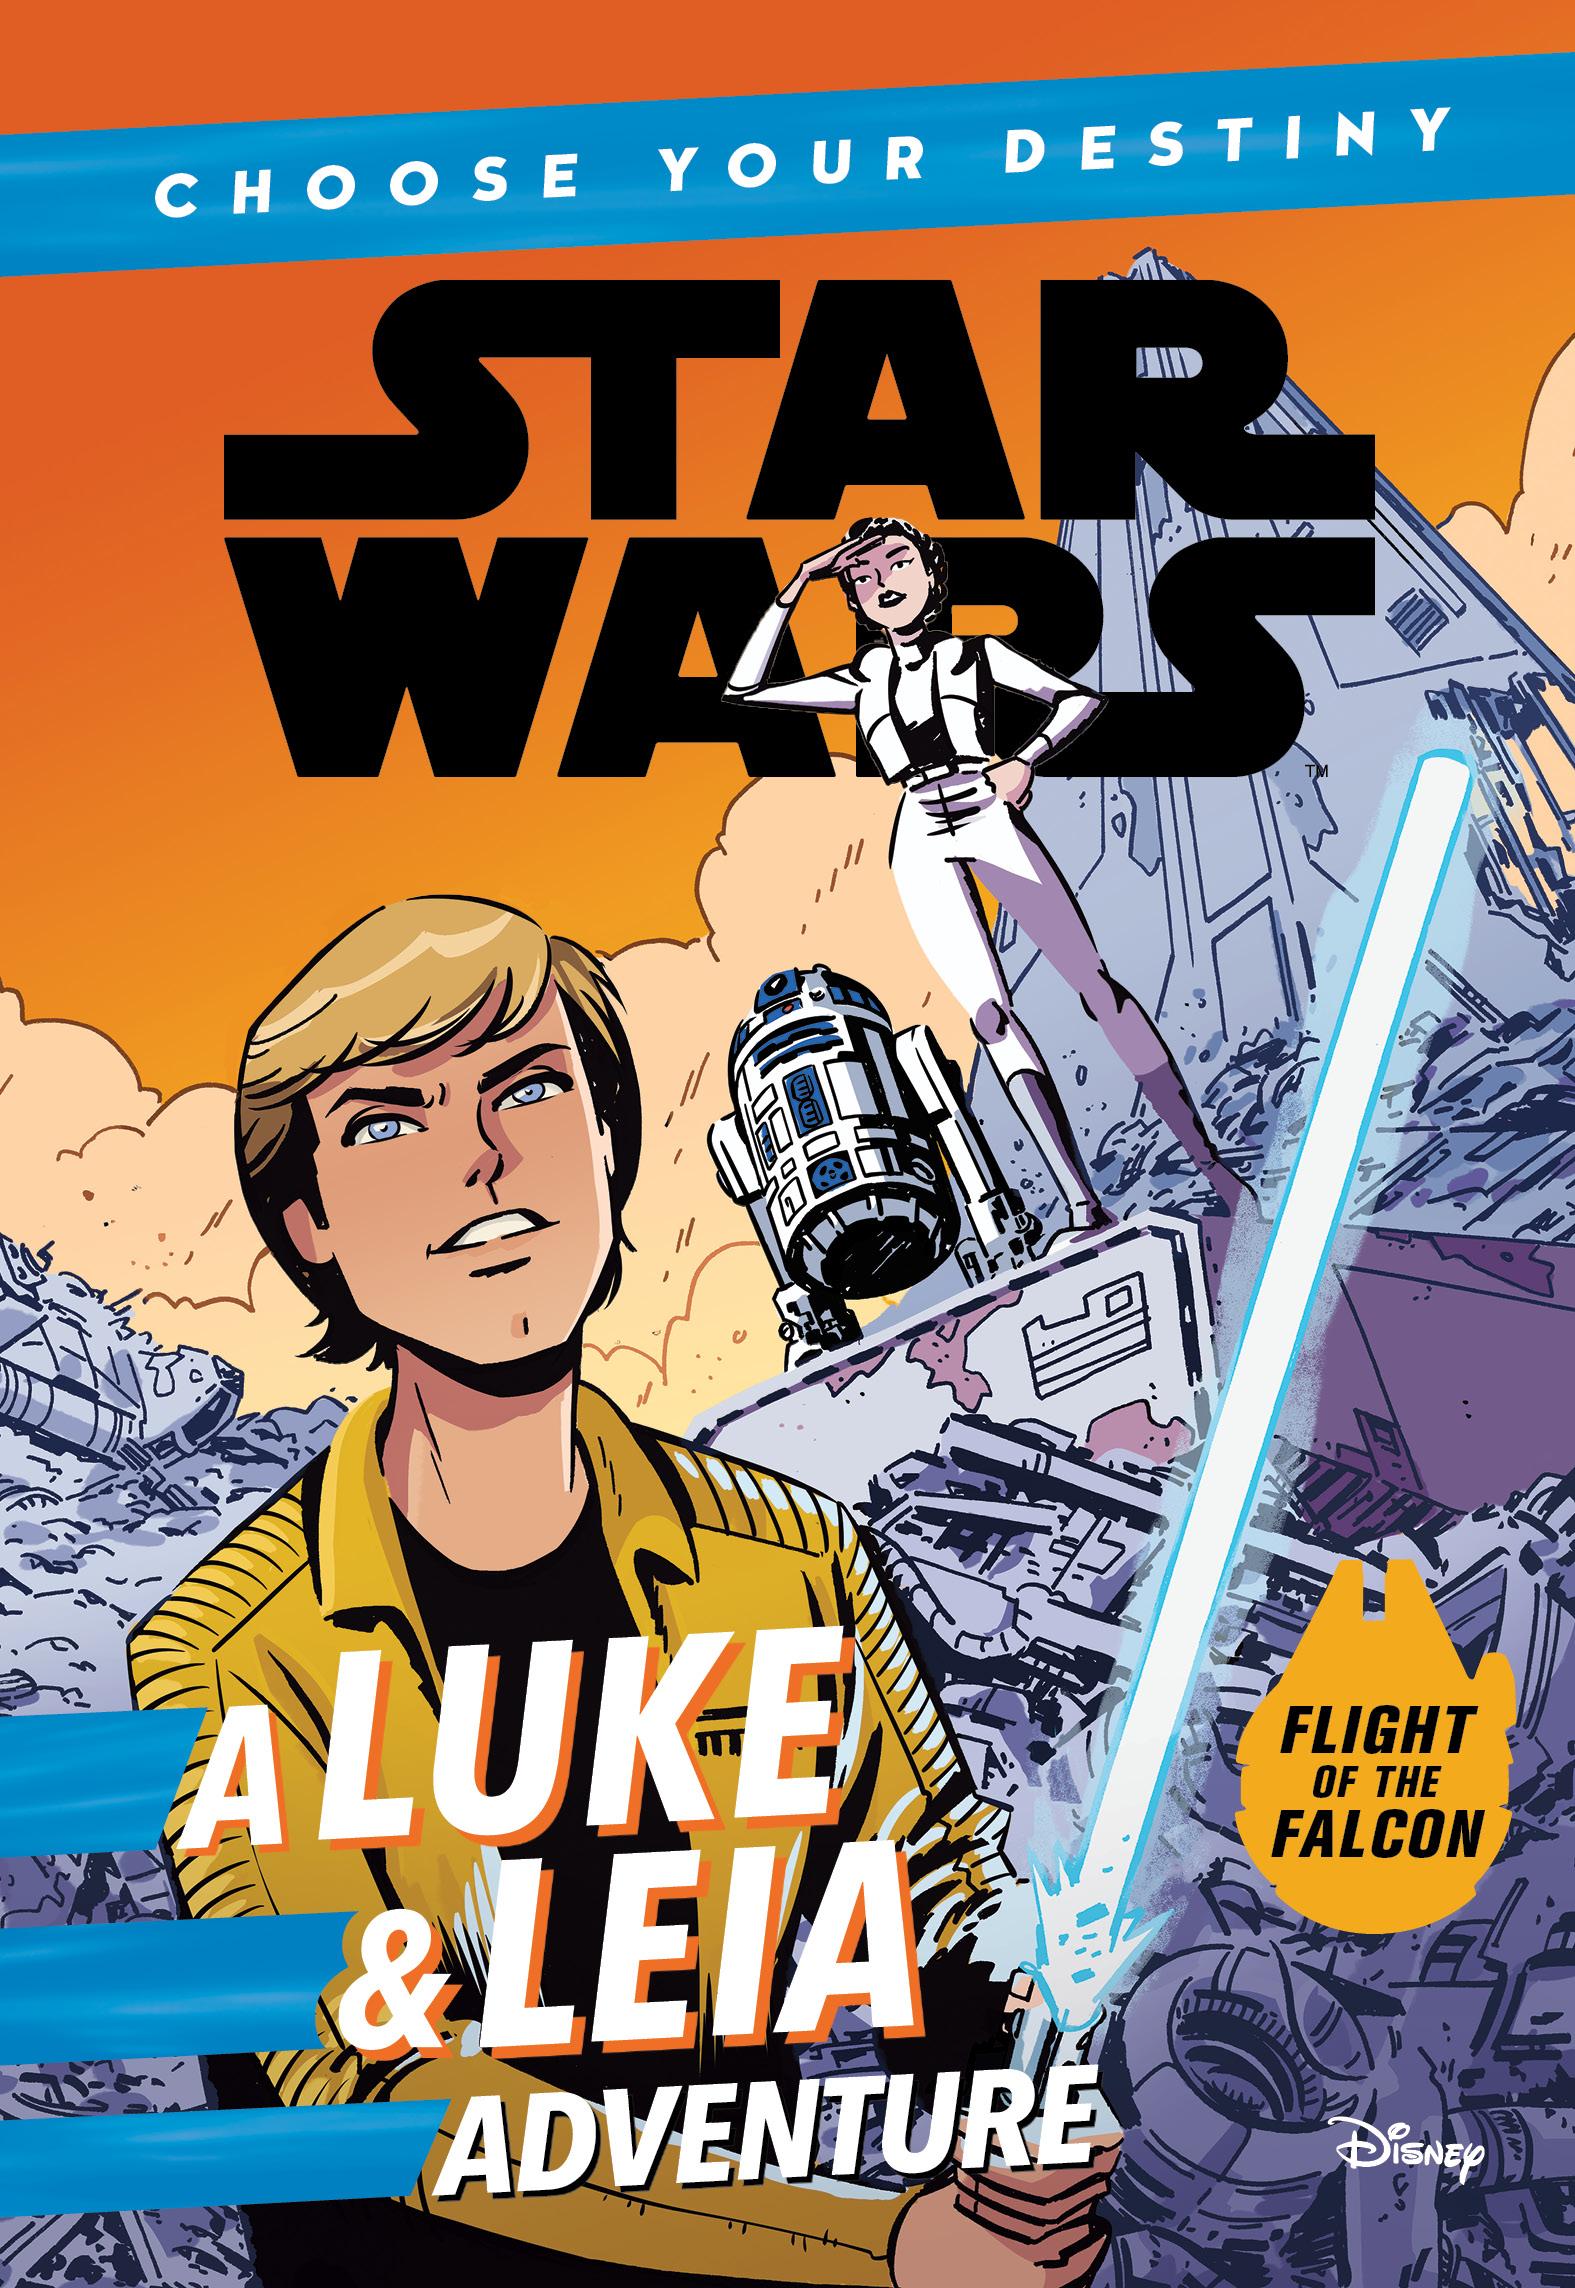 Star Wars_ChooseYourDestiny_LukeLeia_CVR_fnl.jpg